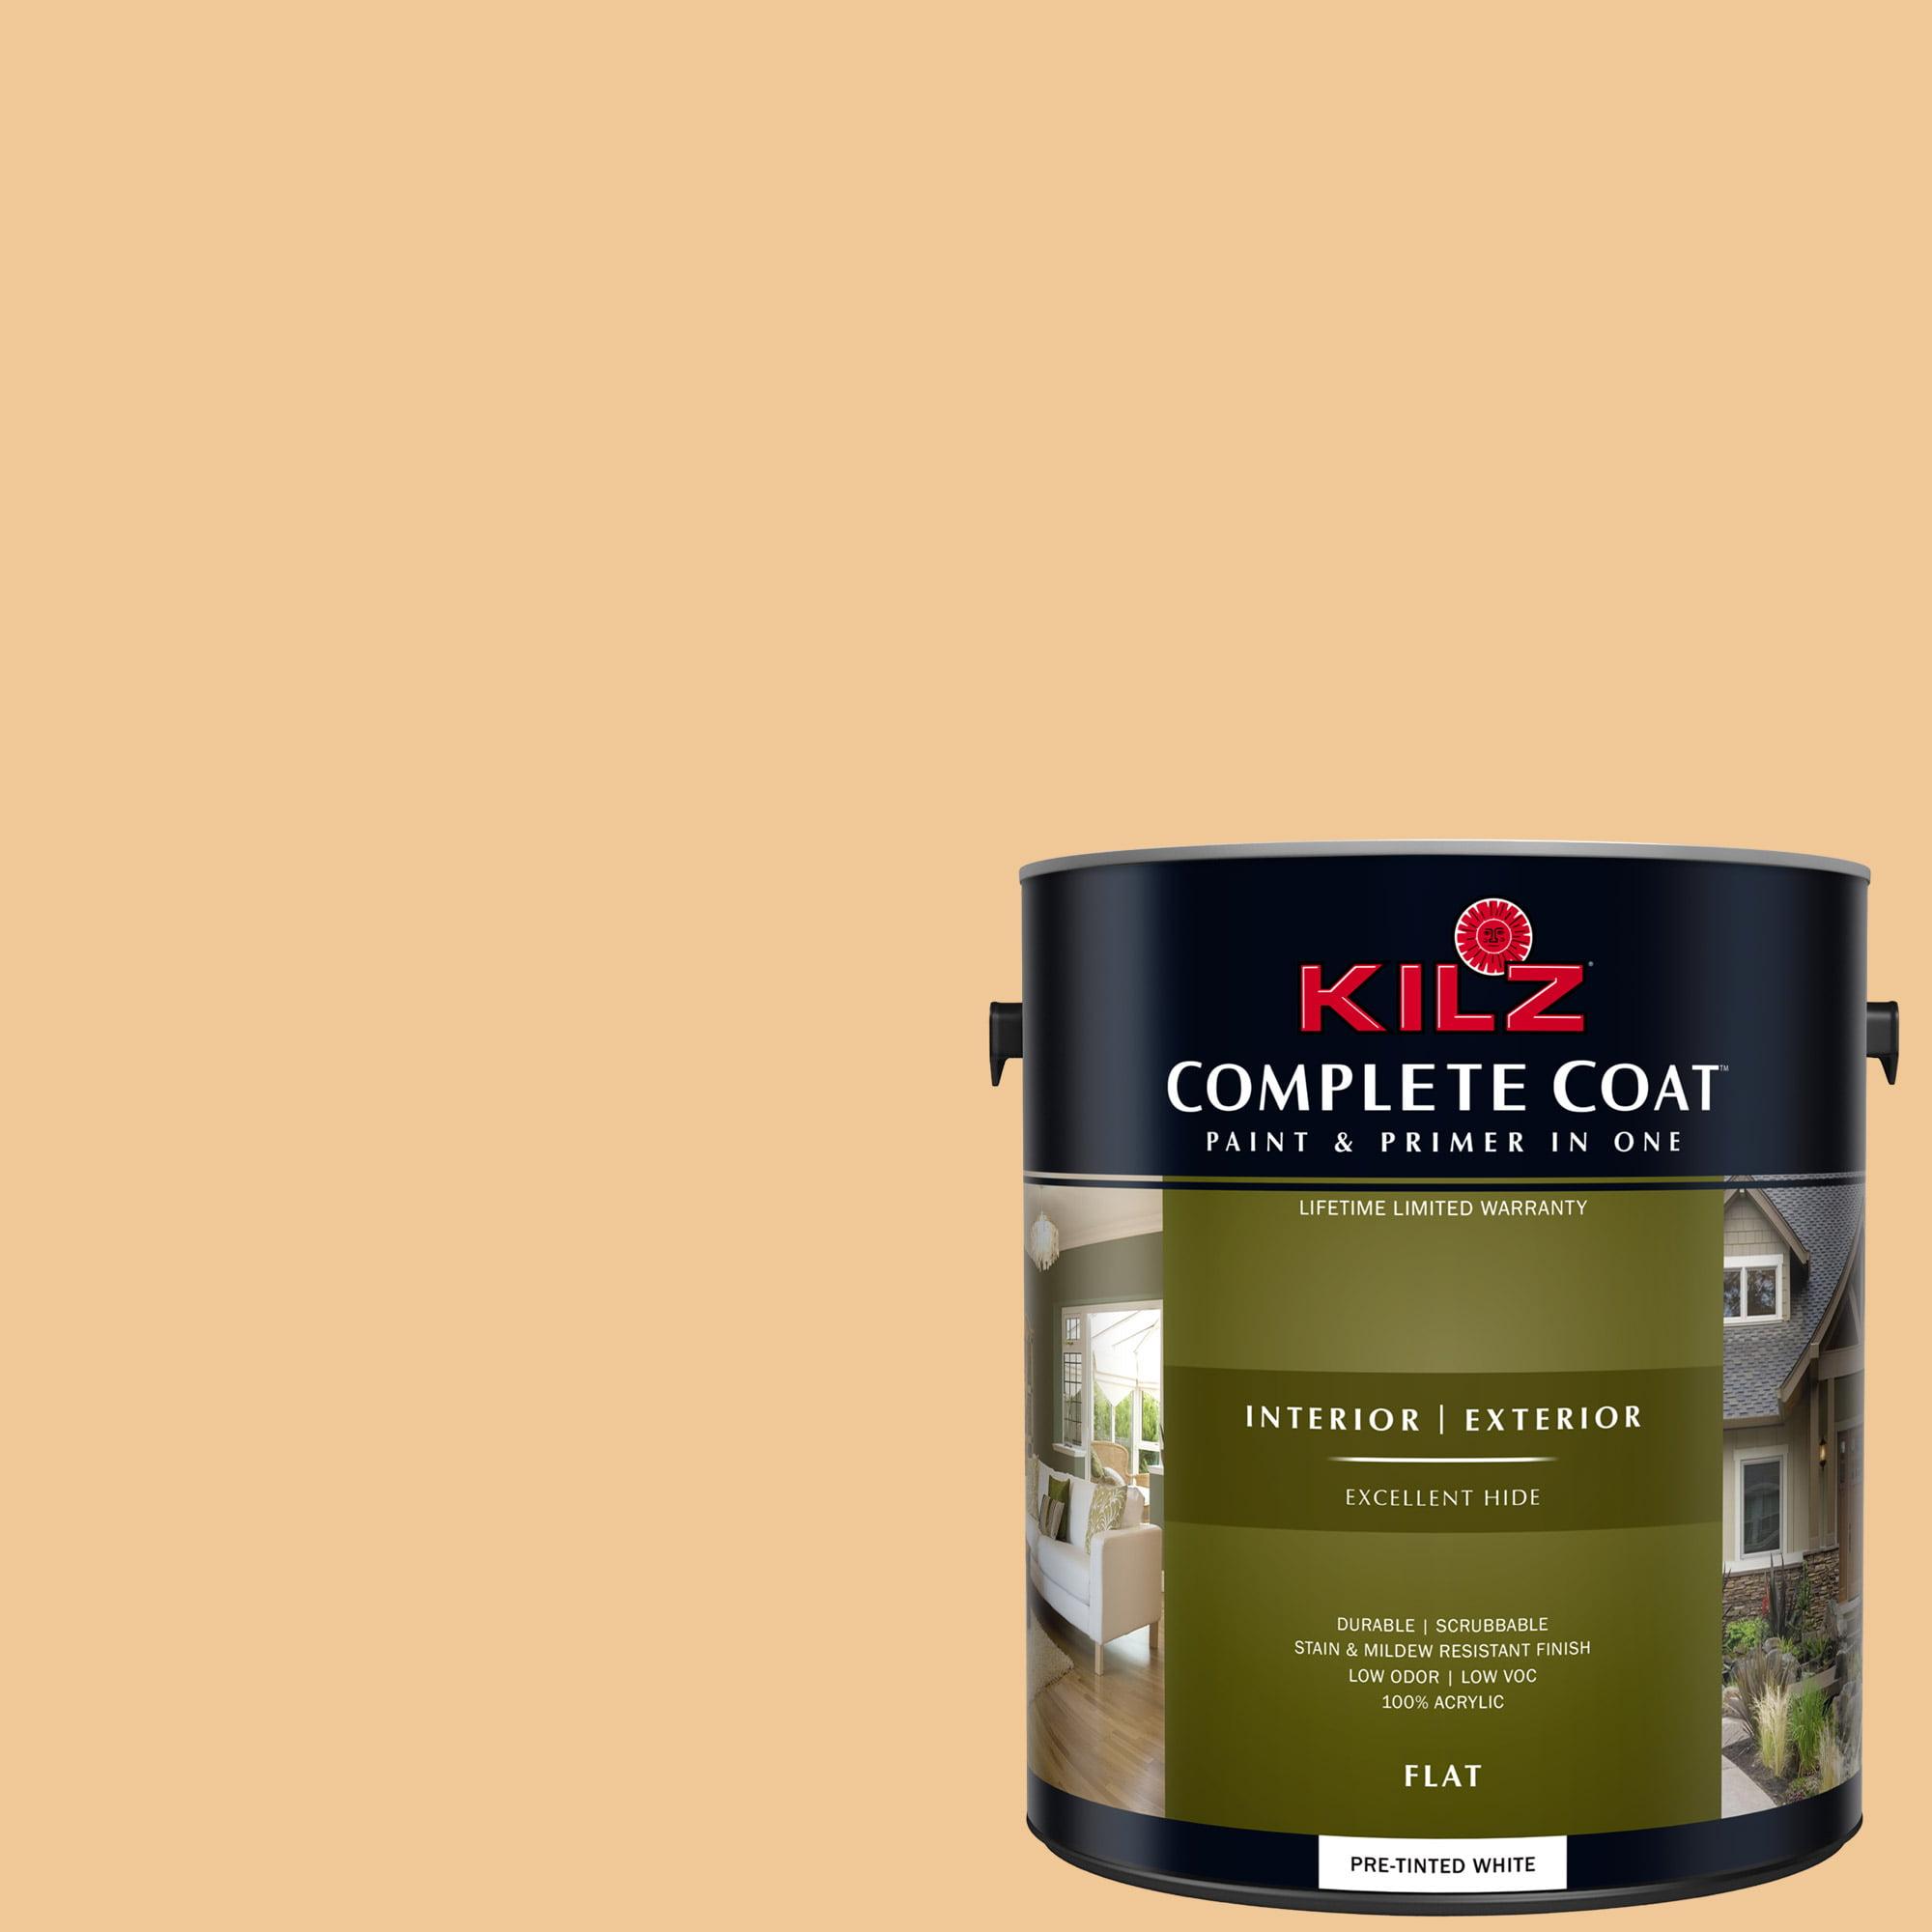 KILZ COMPLETE COAT Interior/Exterior Paint & Primer in One #LD180-02 Citrus Spice